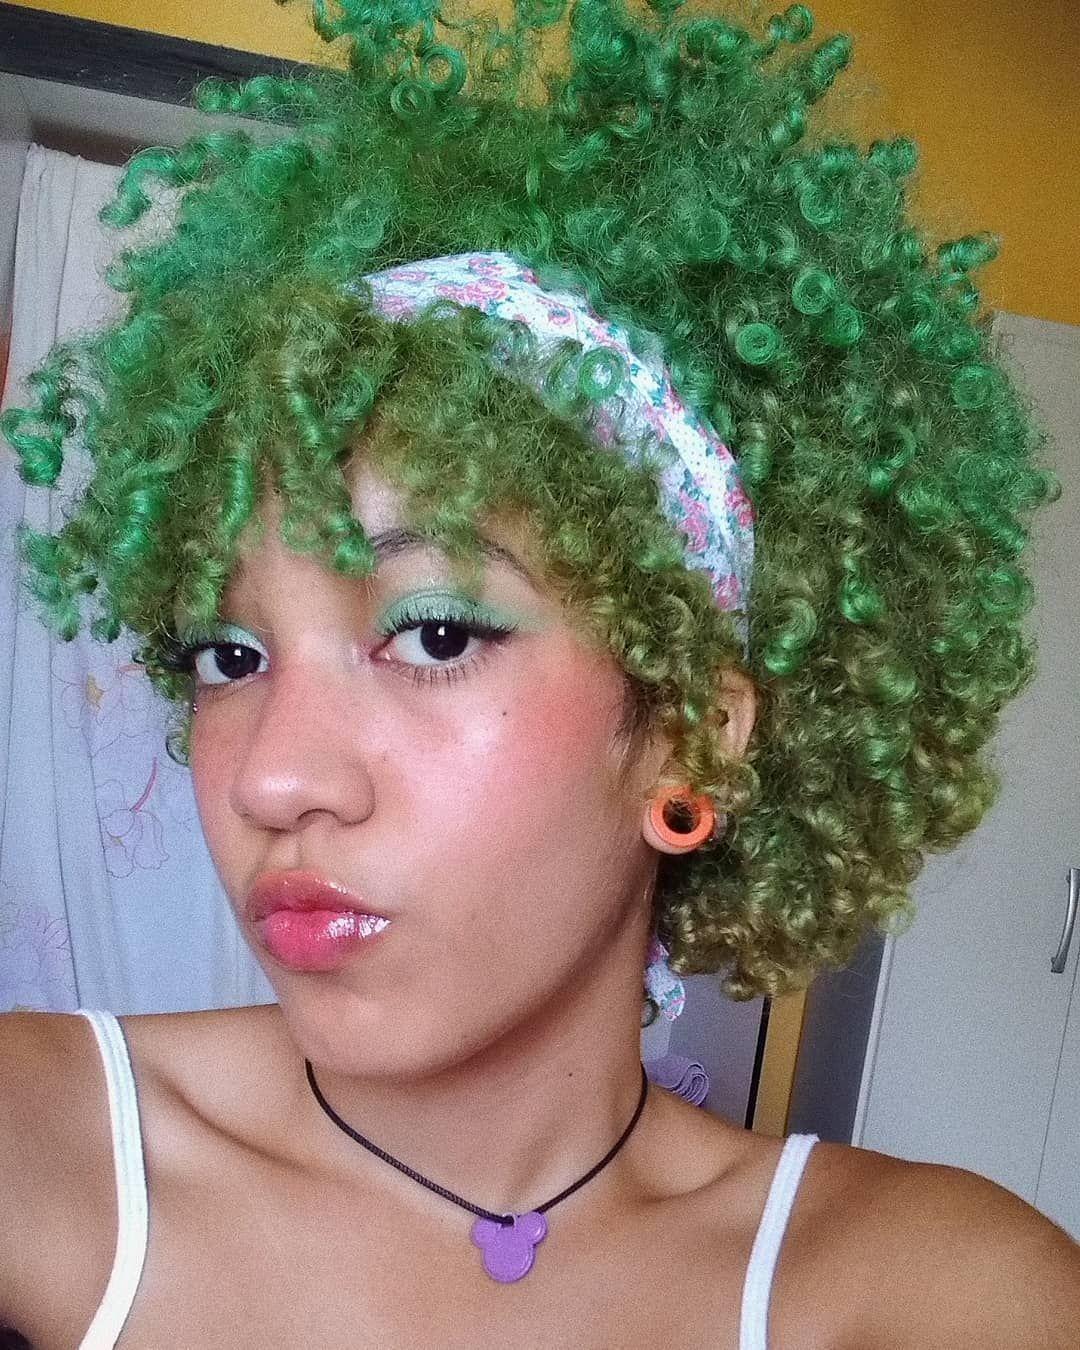 Vou . . . . . . . . #exo_l #aesthetic #kawaii #kawaiigirl #kawaiihair #cute #hairstyle #aestheticmakeup #softgirl #soft #alternative #alternativegirl #edges #edgestutorial #babyhair #hairedges #curlyhair #softpink #greenhair #glow  #cutie #cutehair  #cabelocacheadocolorido #cabelocolorido #naturalhair #cabeloverde💚 #naturalhairloves #cabeloverde  #verde #green